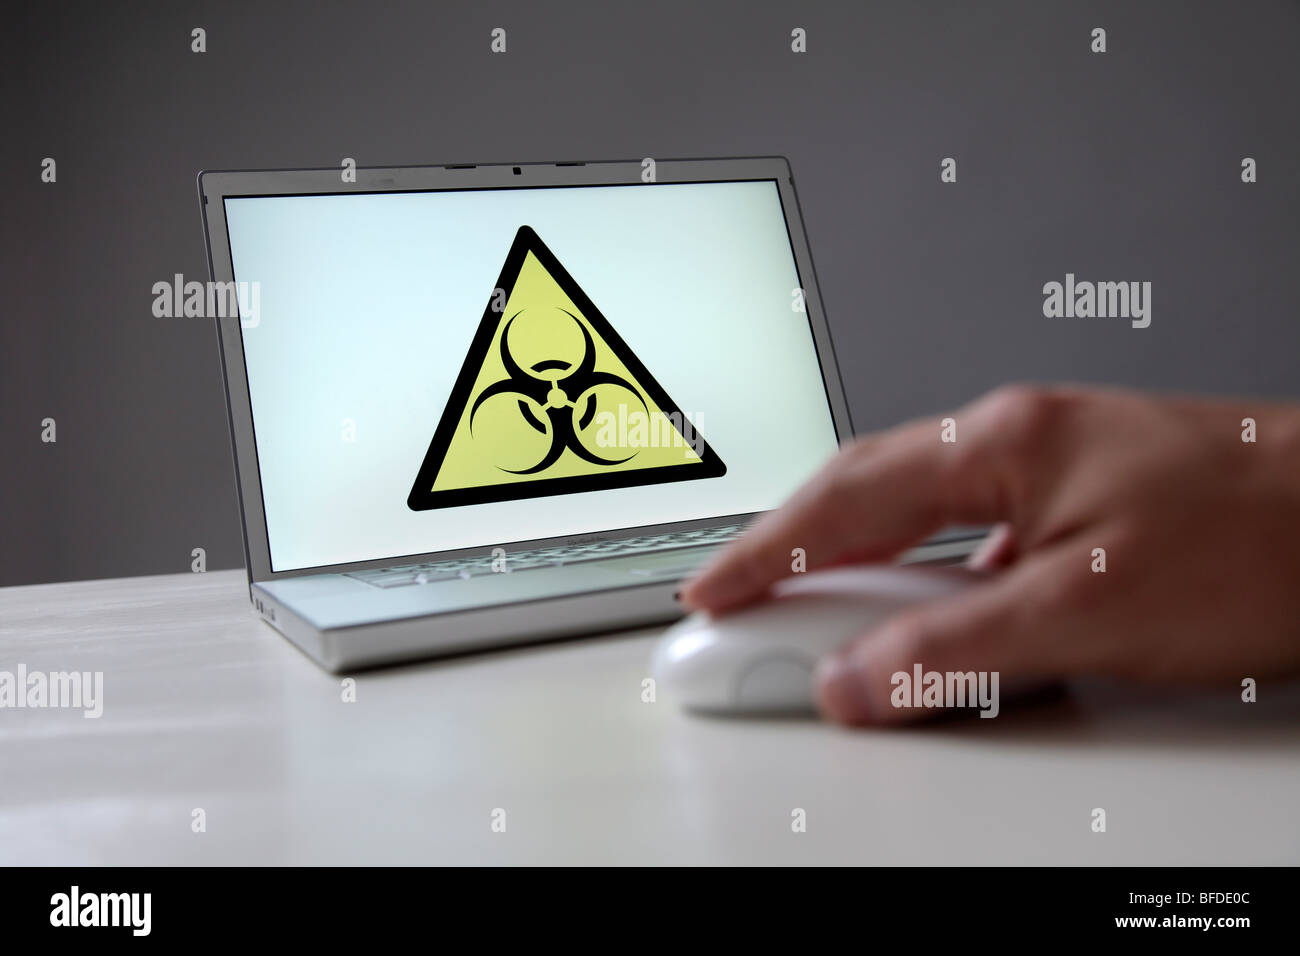 Biohazard sign on a computer screen. Symbol: computer virus, worm, etc - Stock Image